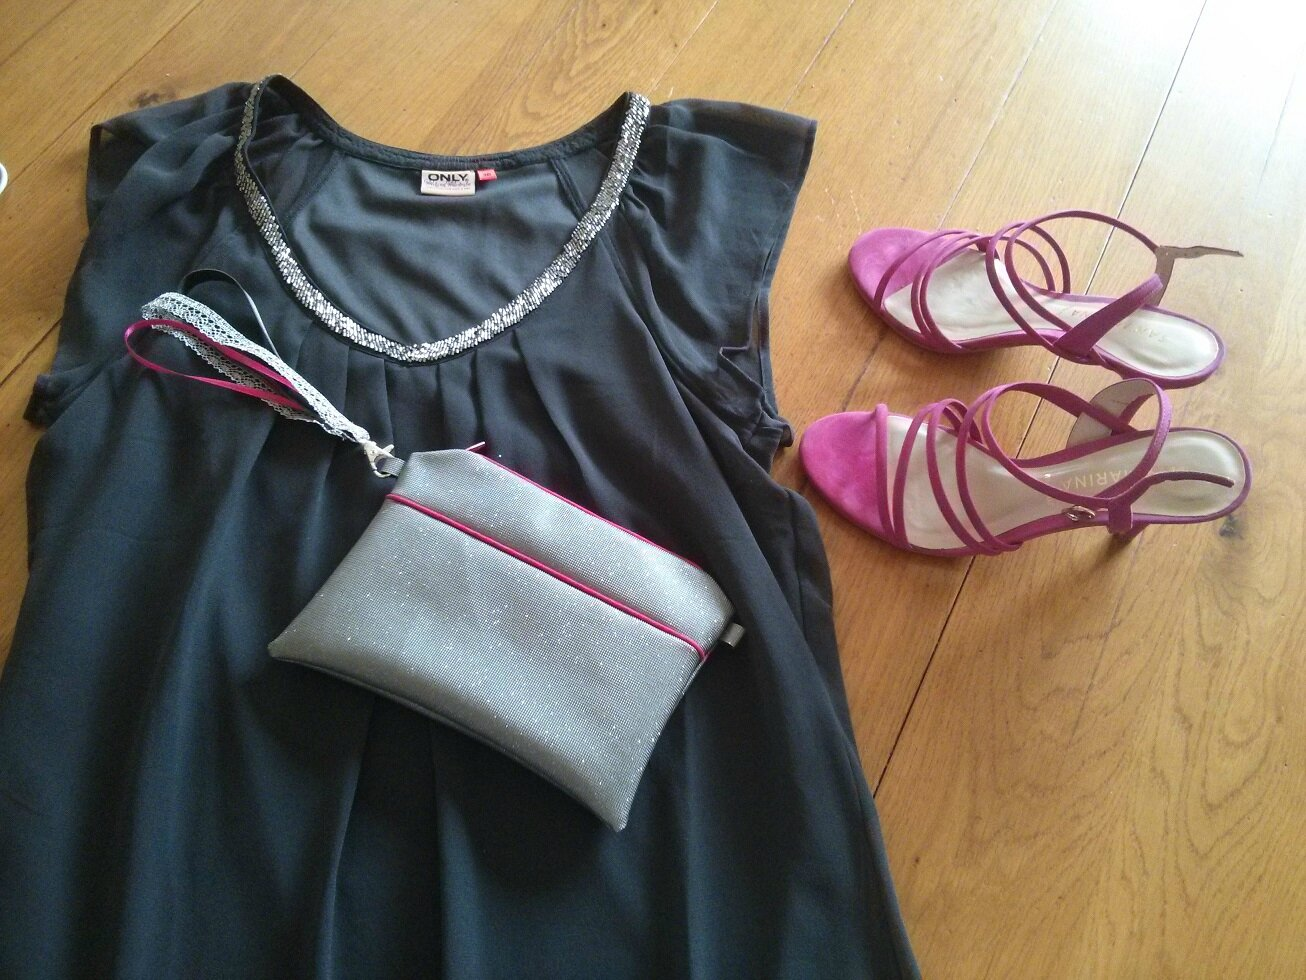 Pochette swarowski gris rose et tenue